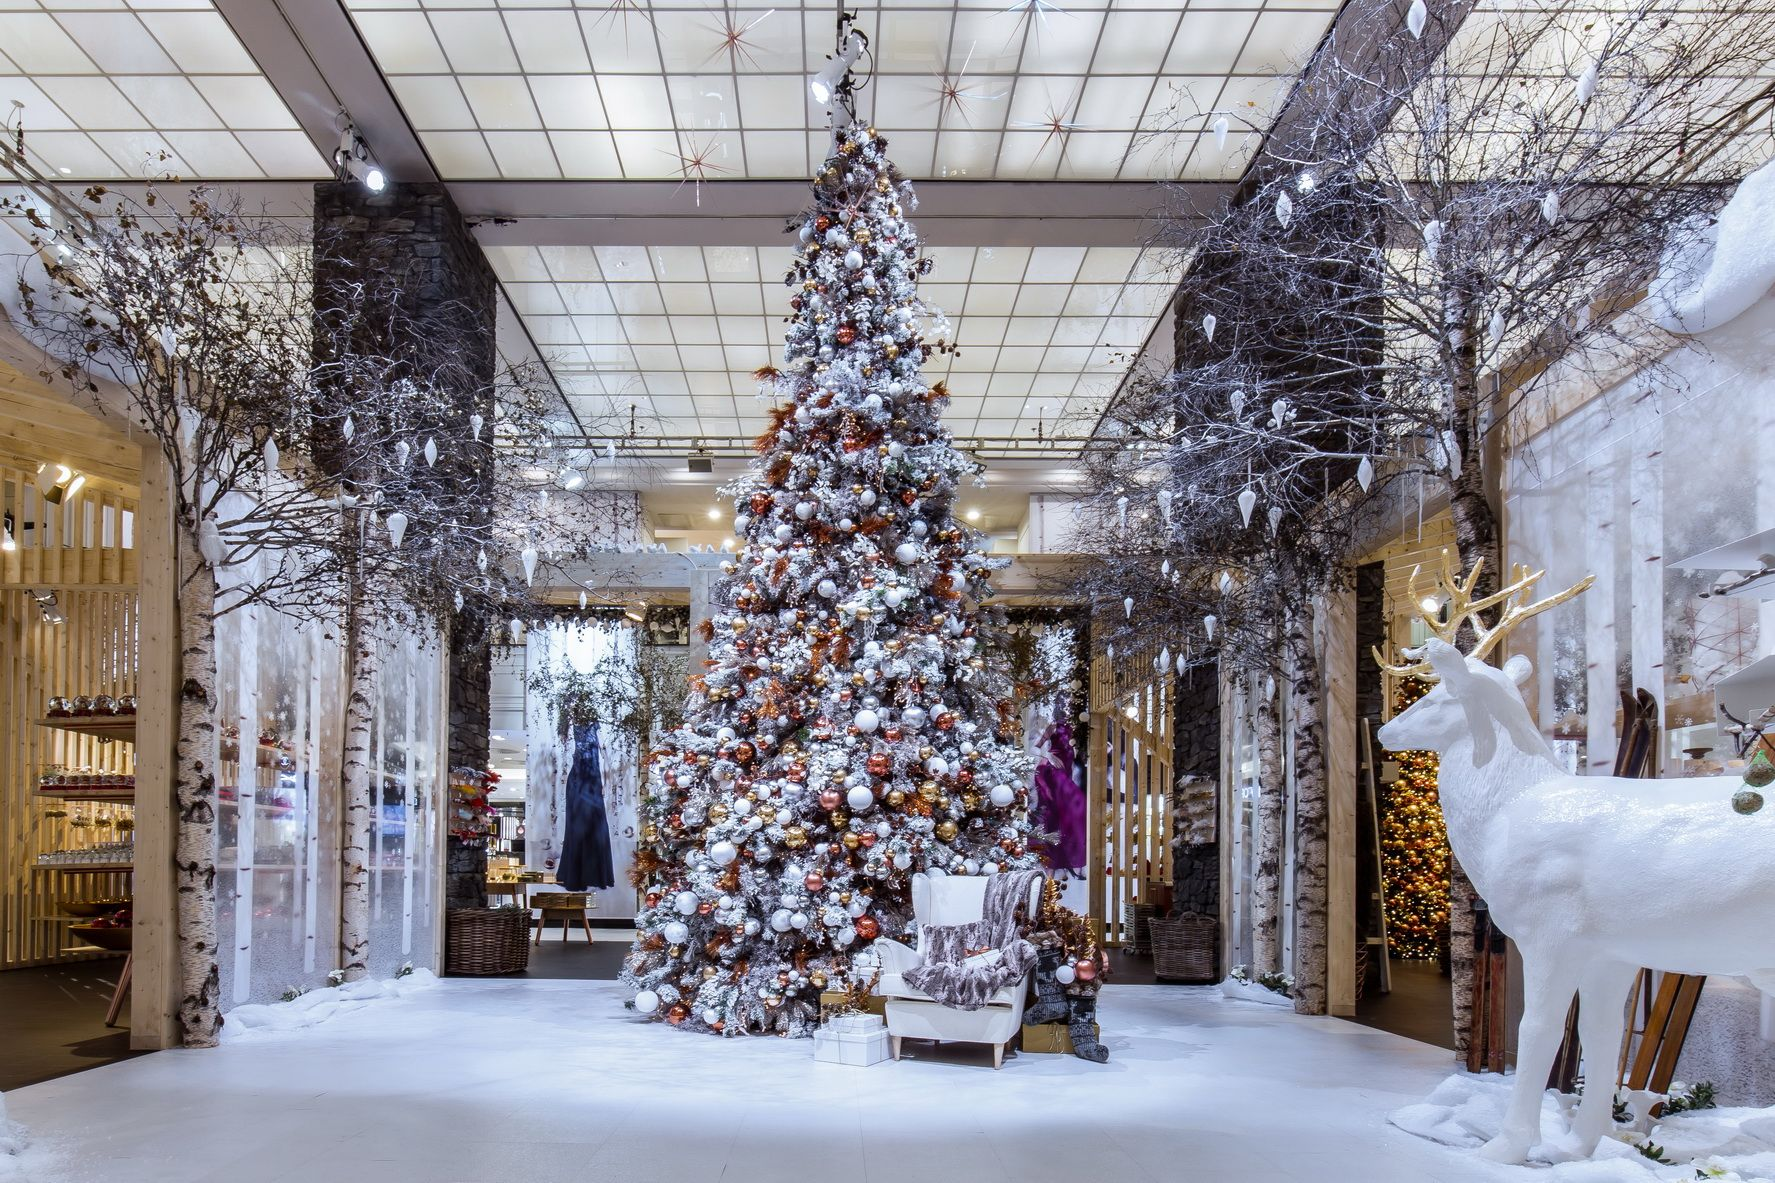 atrium kadewe berlin 2000 2019 christmas christmas. Black Bedroom Furniture Sets. Home Design Ideas